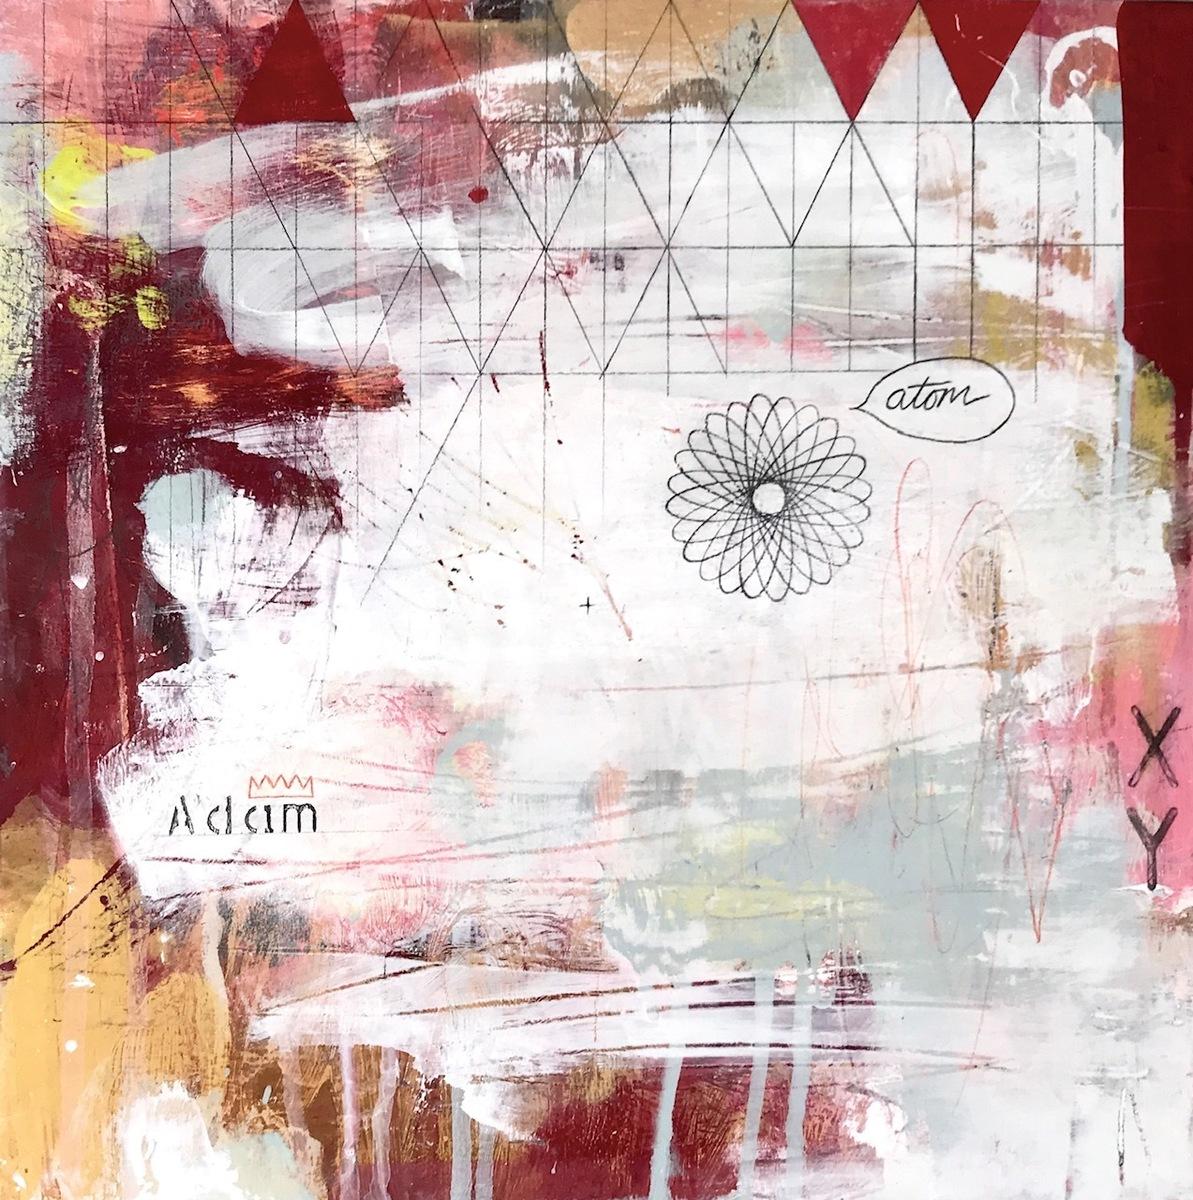 Emma Marie - Adam, Atom